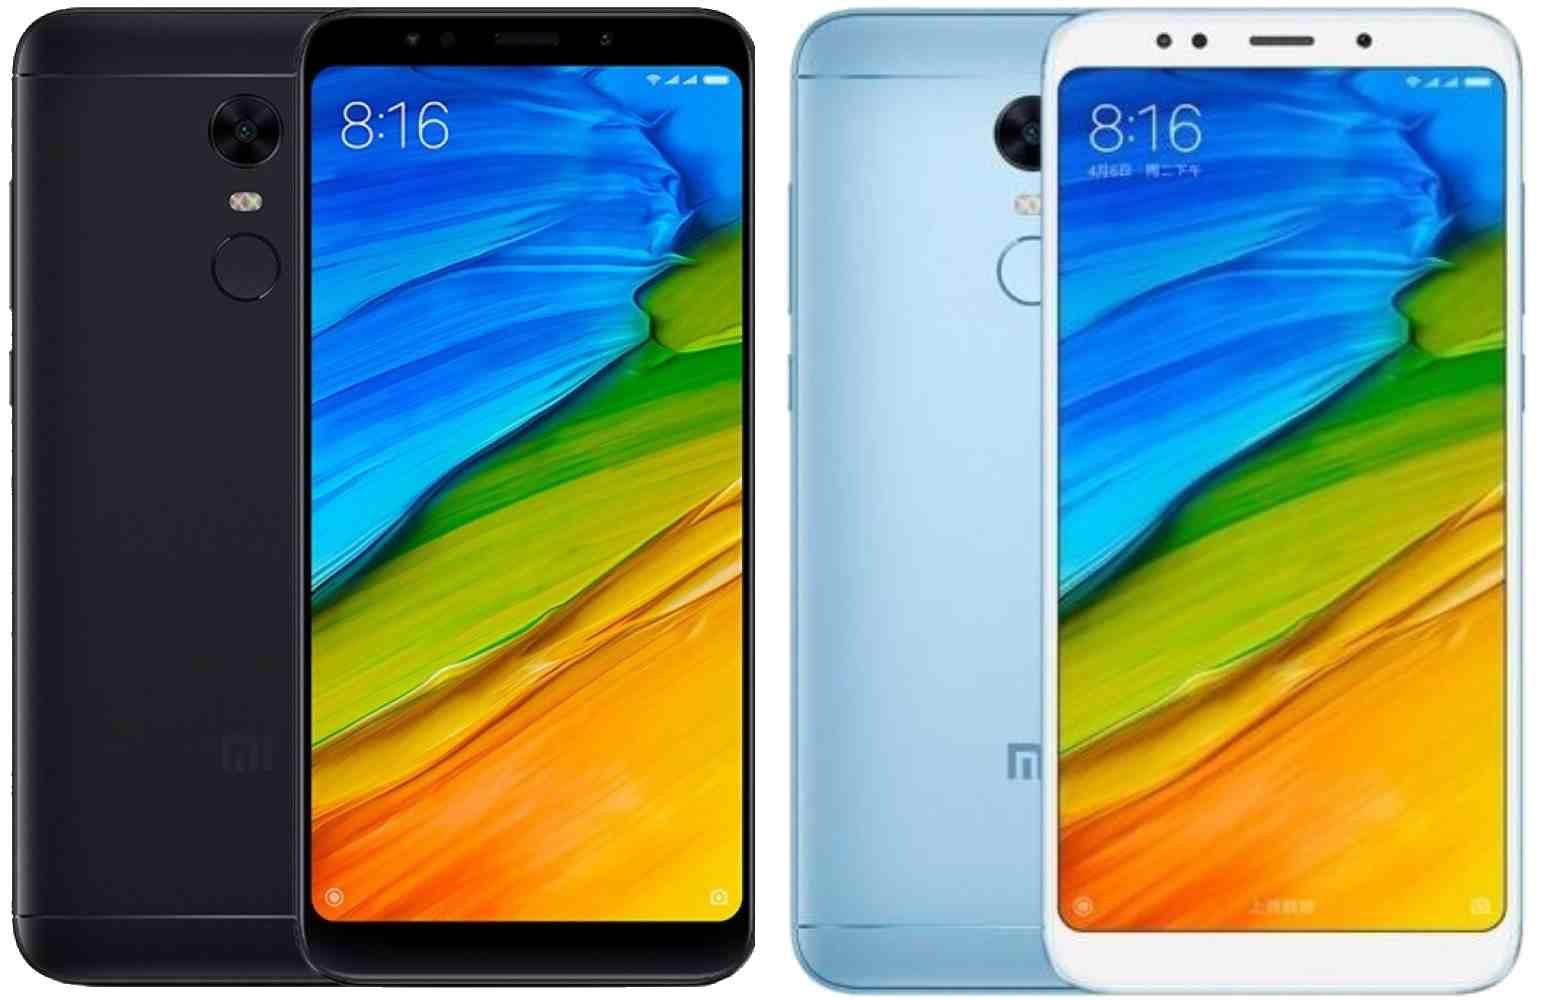 Xiaomi Redmi 5 Plus 4/64 Black